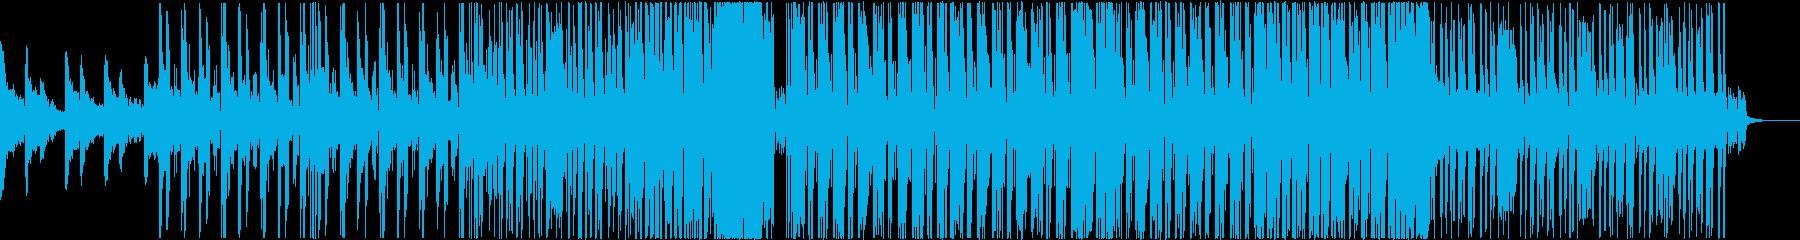 Kawaii系Future Bass 2の再生済みの波形